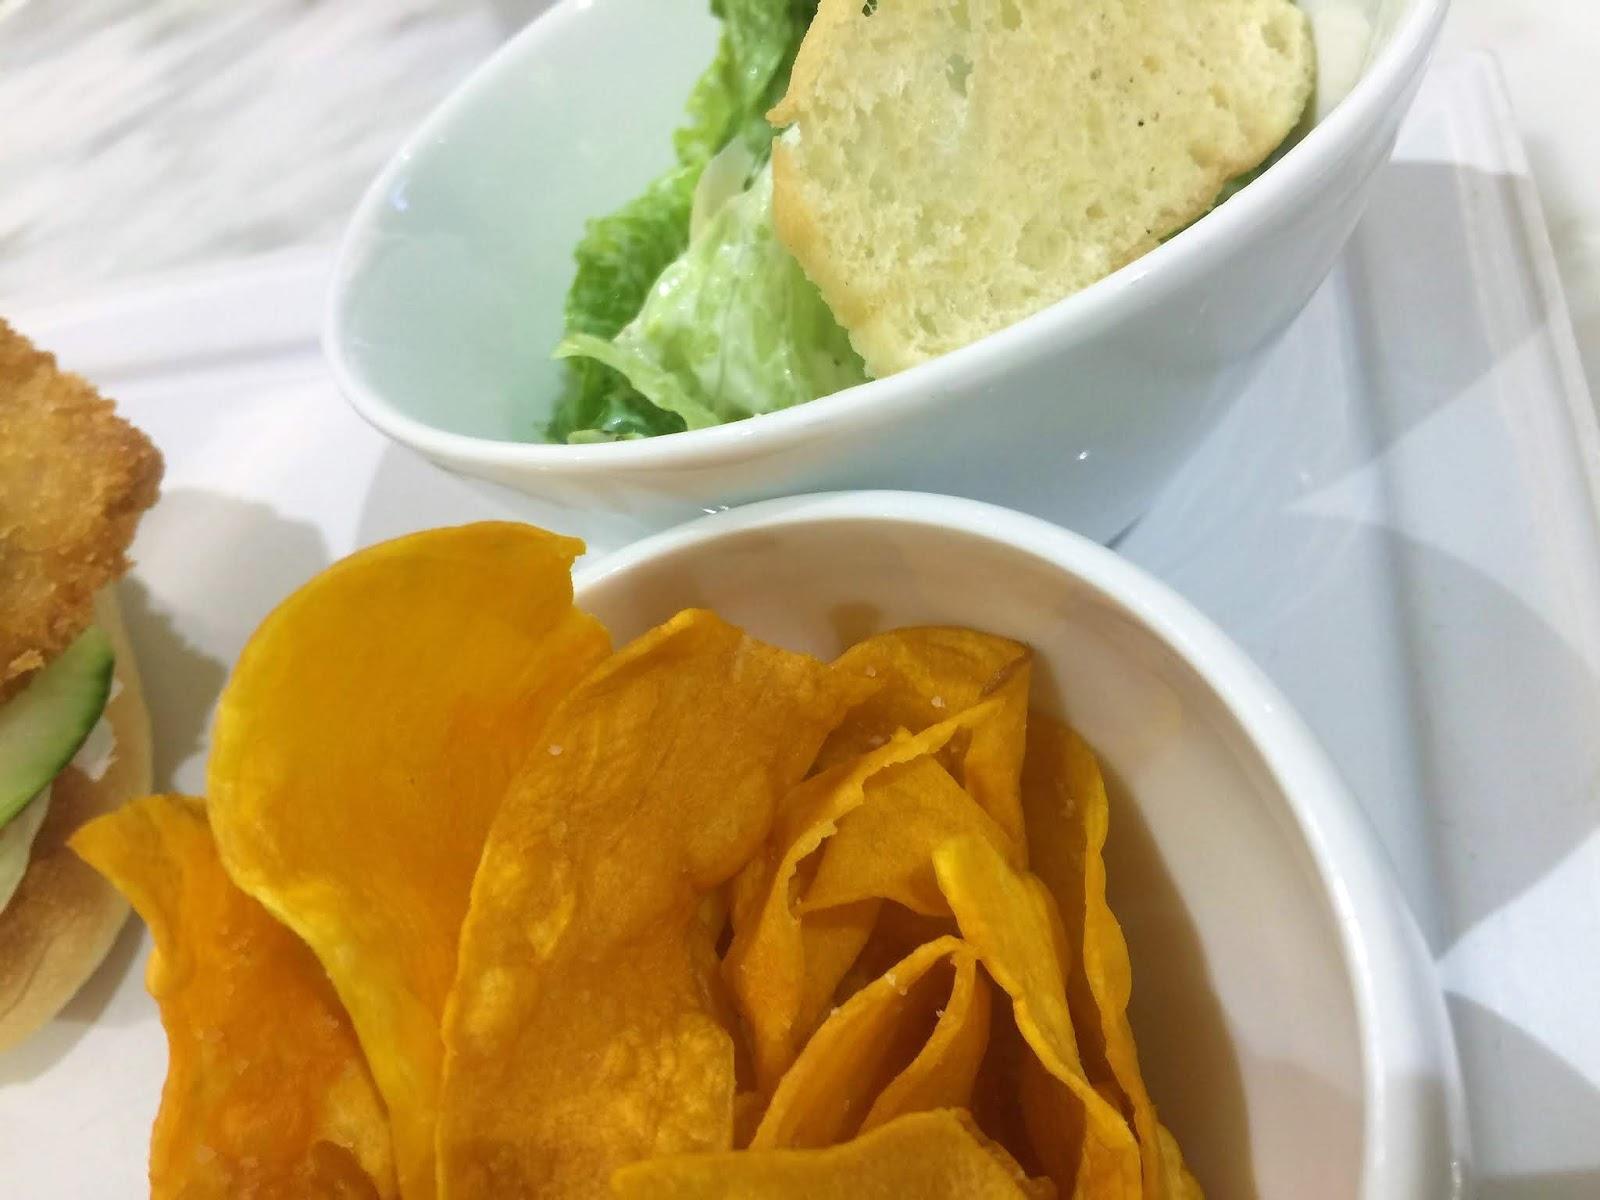 Sweet potato mojos and caesar salad in Cafe Society